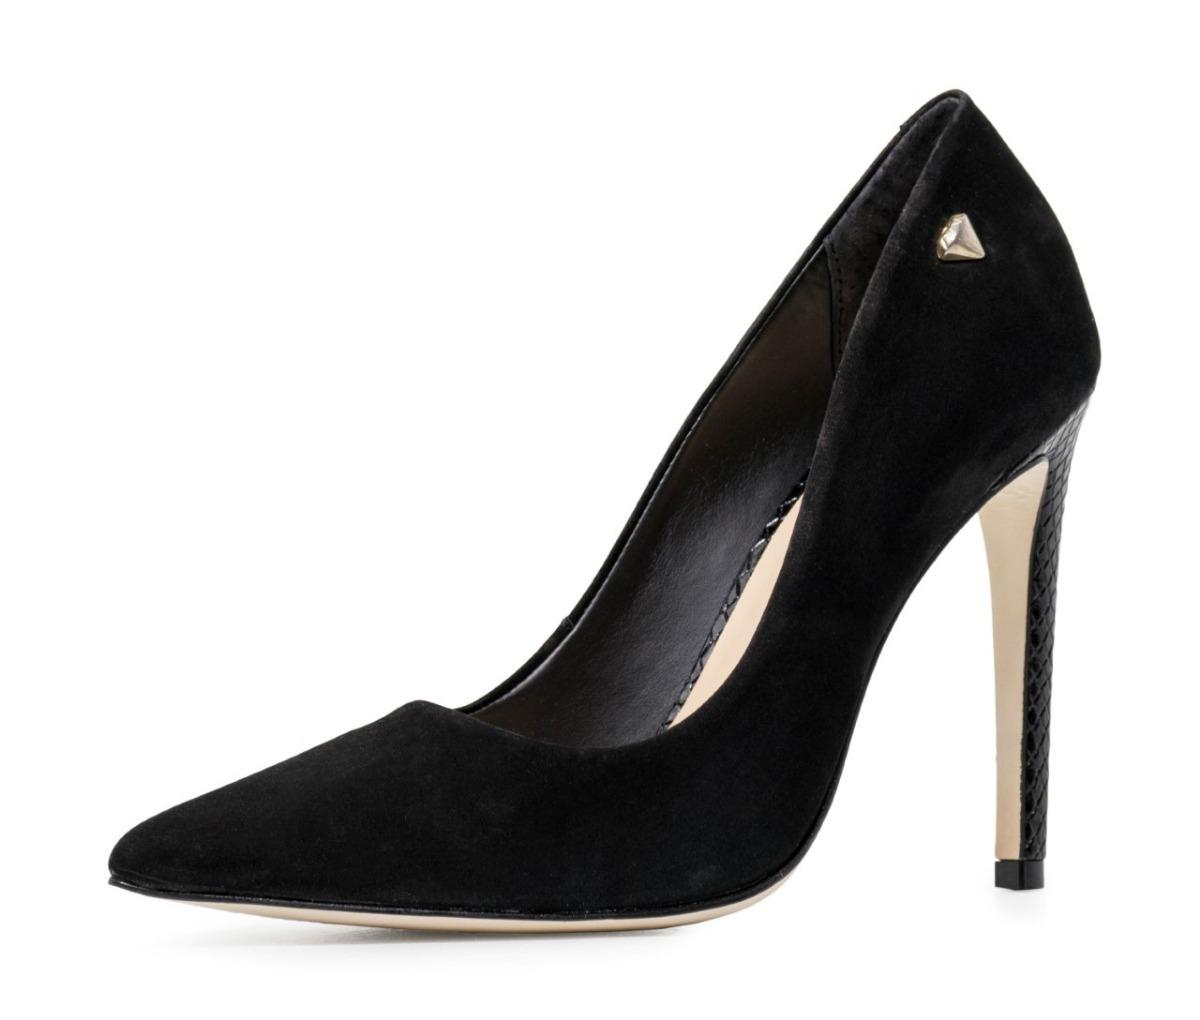 e8aebe8dc0 sapatos femininos bico fino 117618-3 tipo schutz. Carregando zoom.